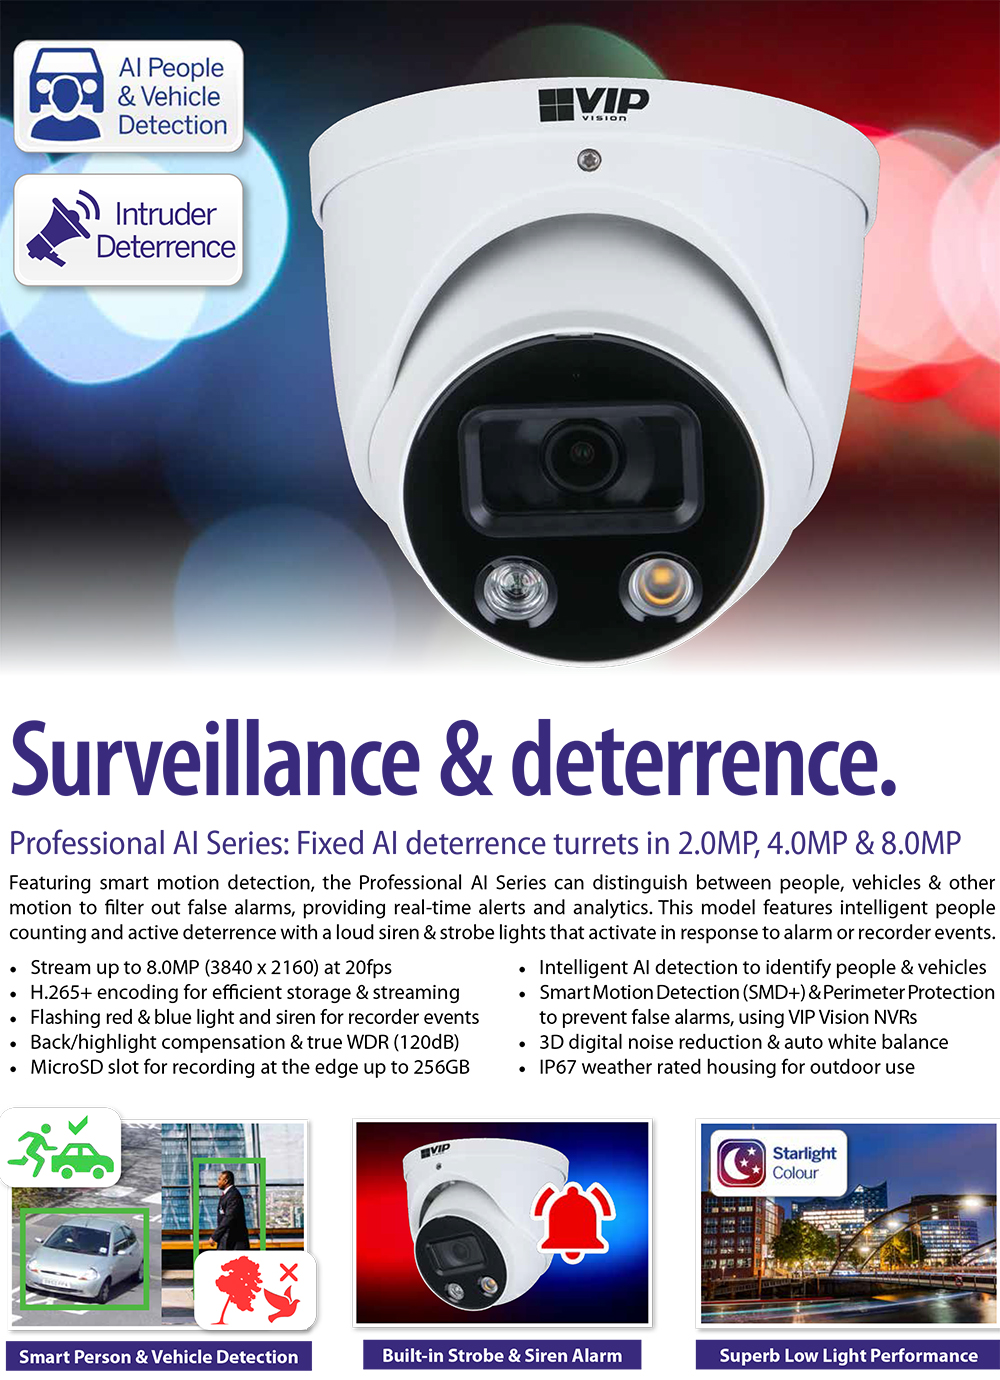 VIP Vision Pro AI Series Deterrence Domes Datasheet (PDF)-1_1.jpg